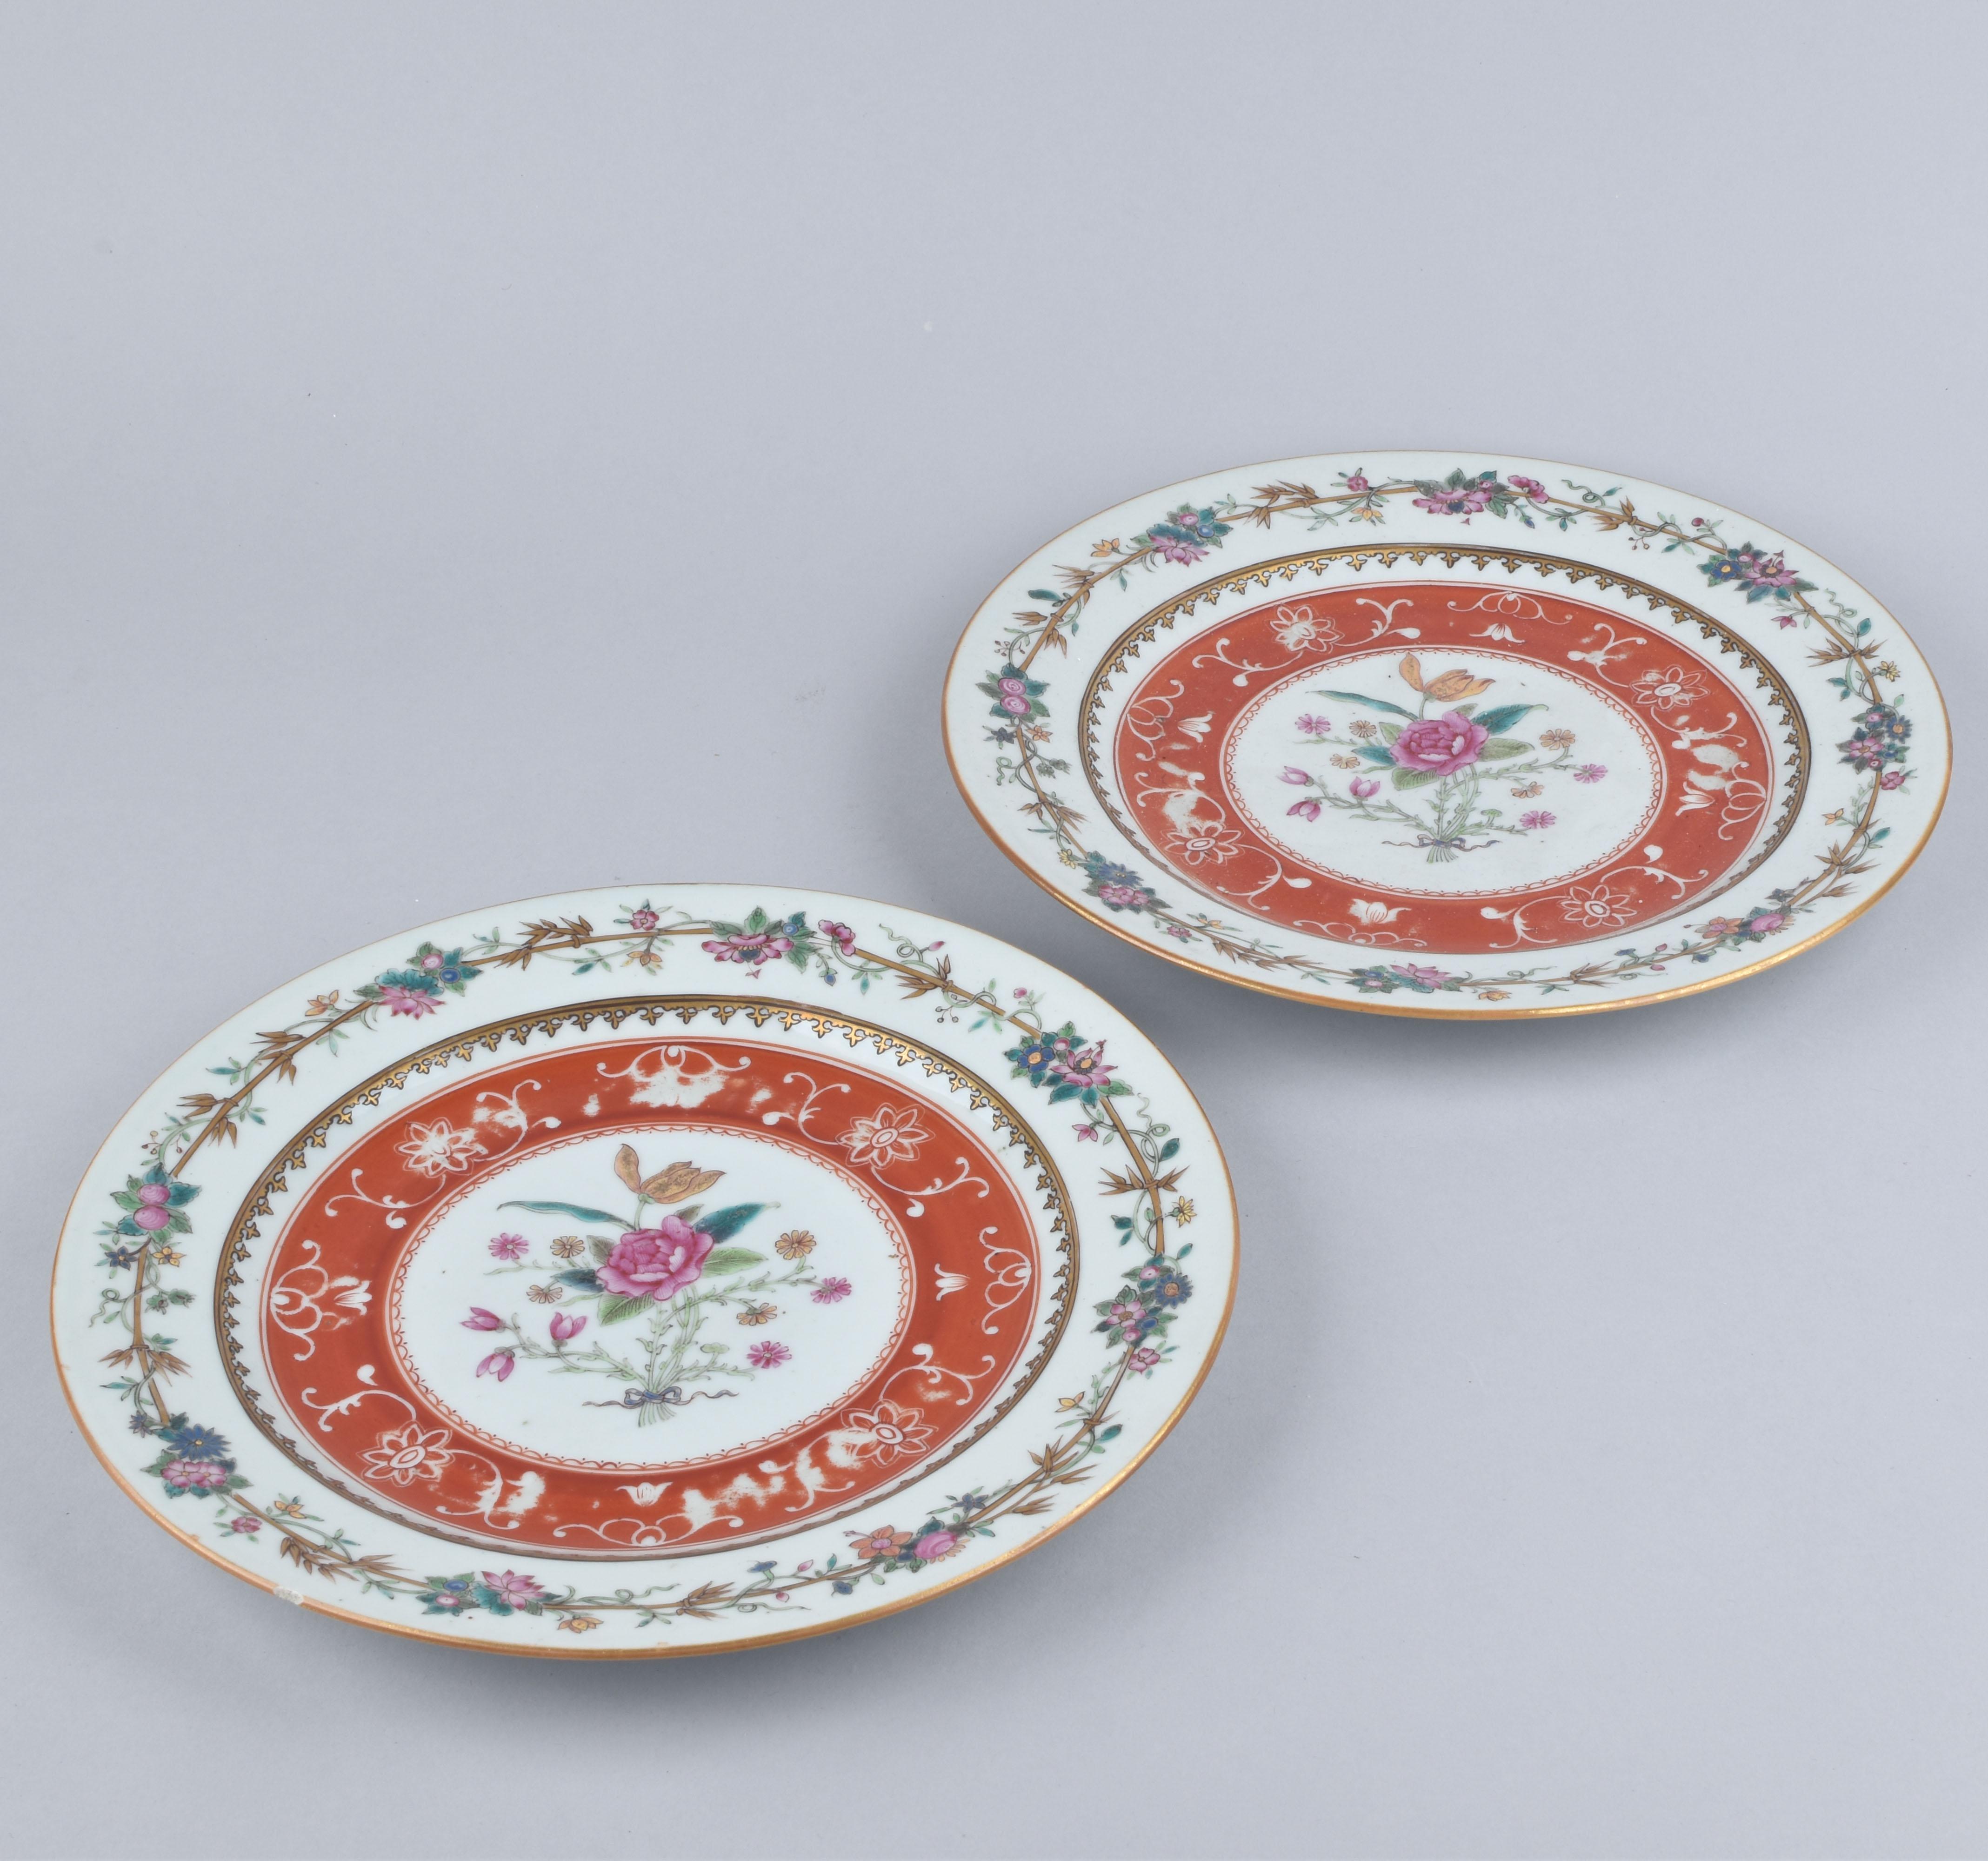 Porcelaine Qianlong (1735-1795), China